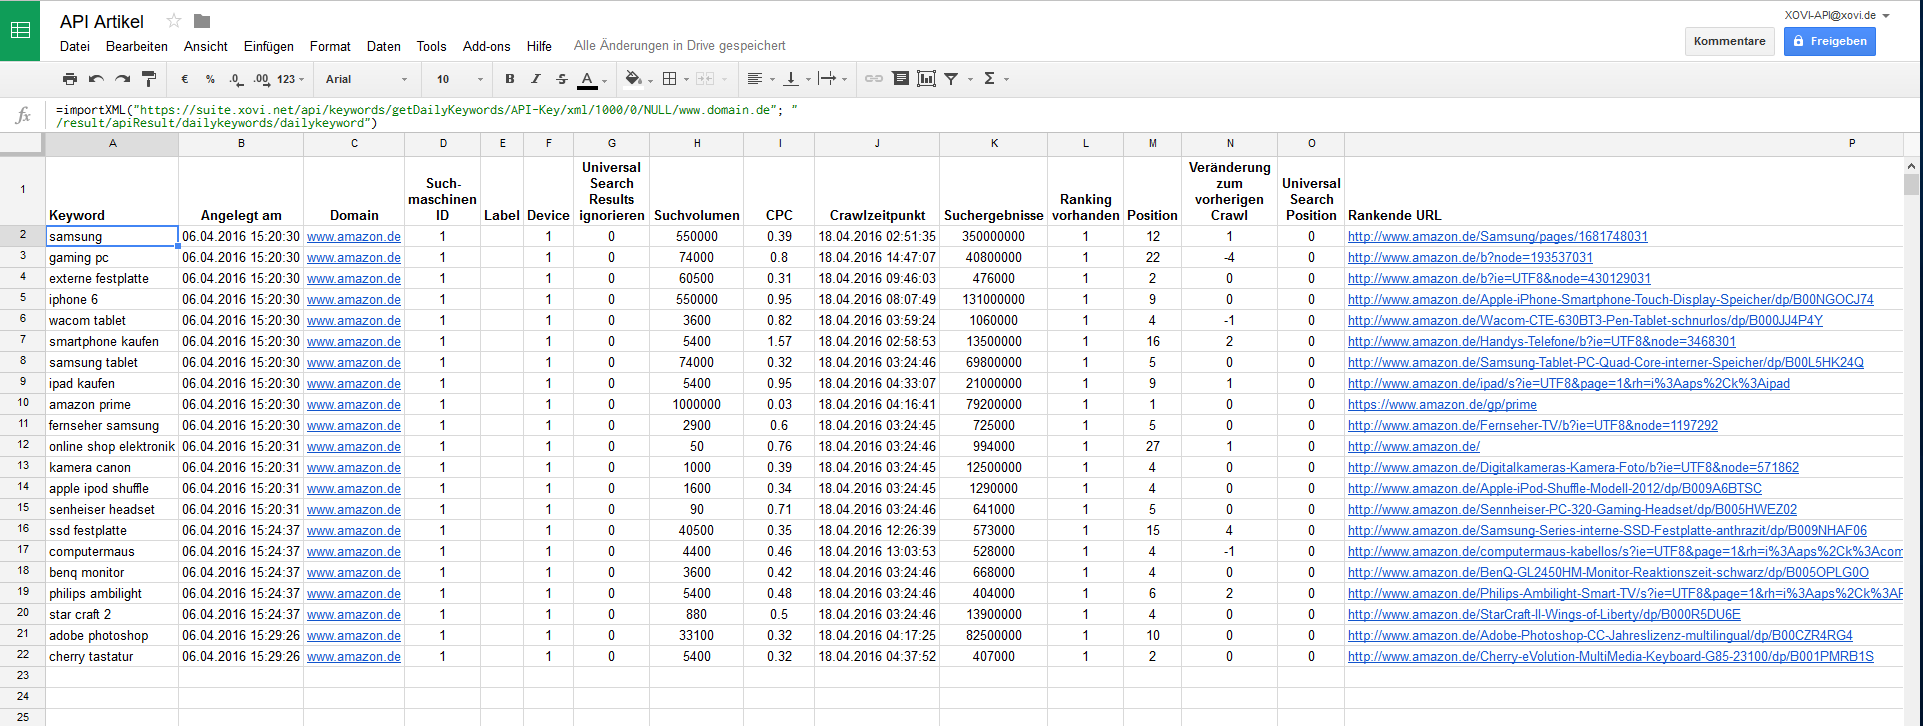 Google Spreadsheet Ergebnis